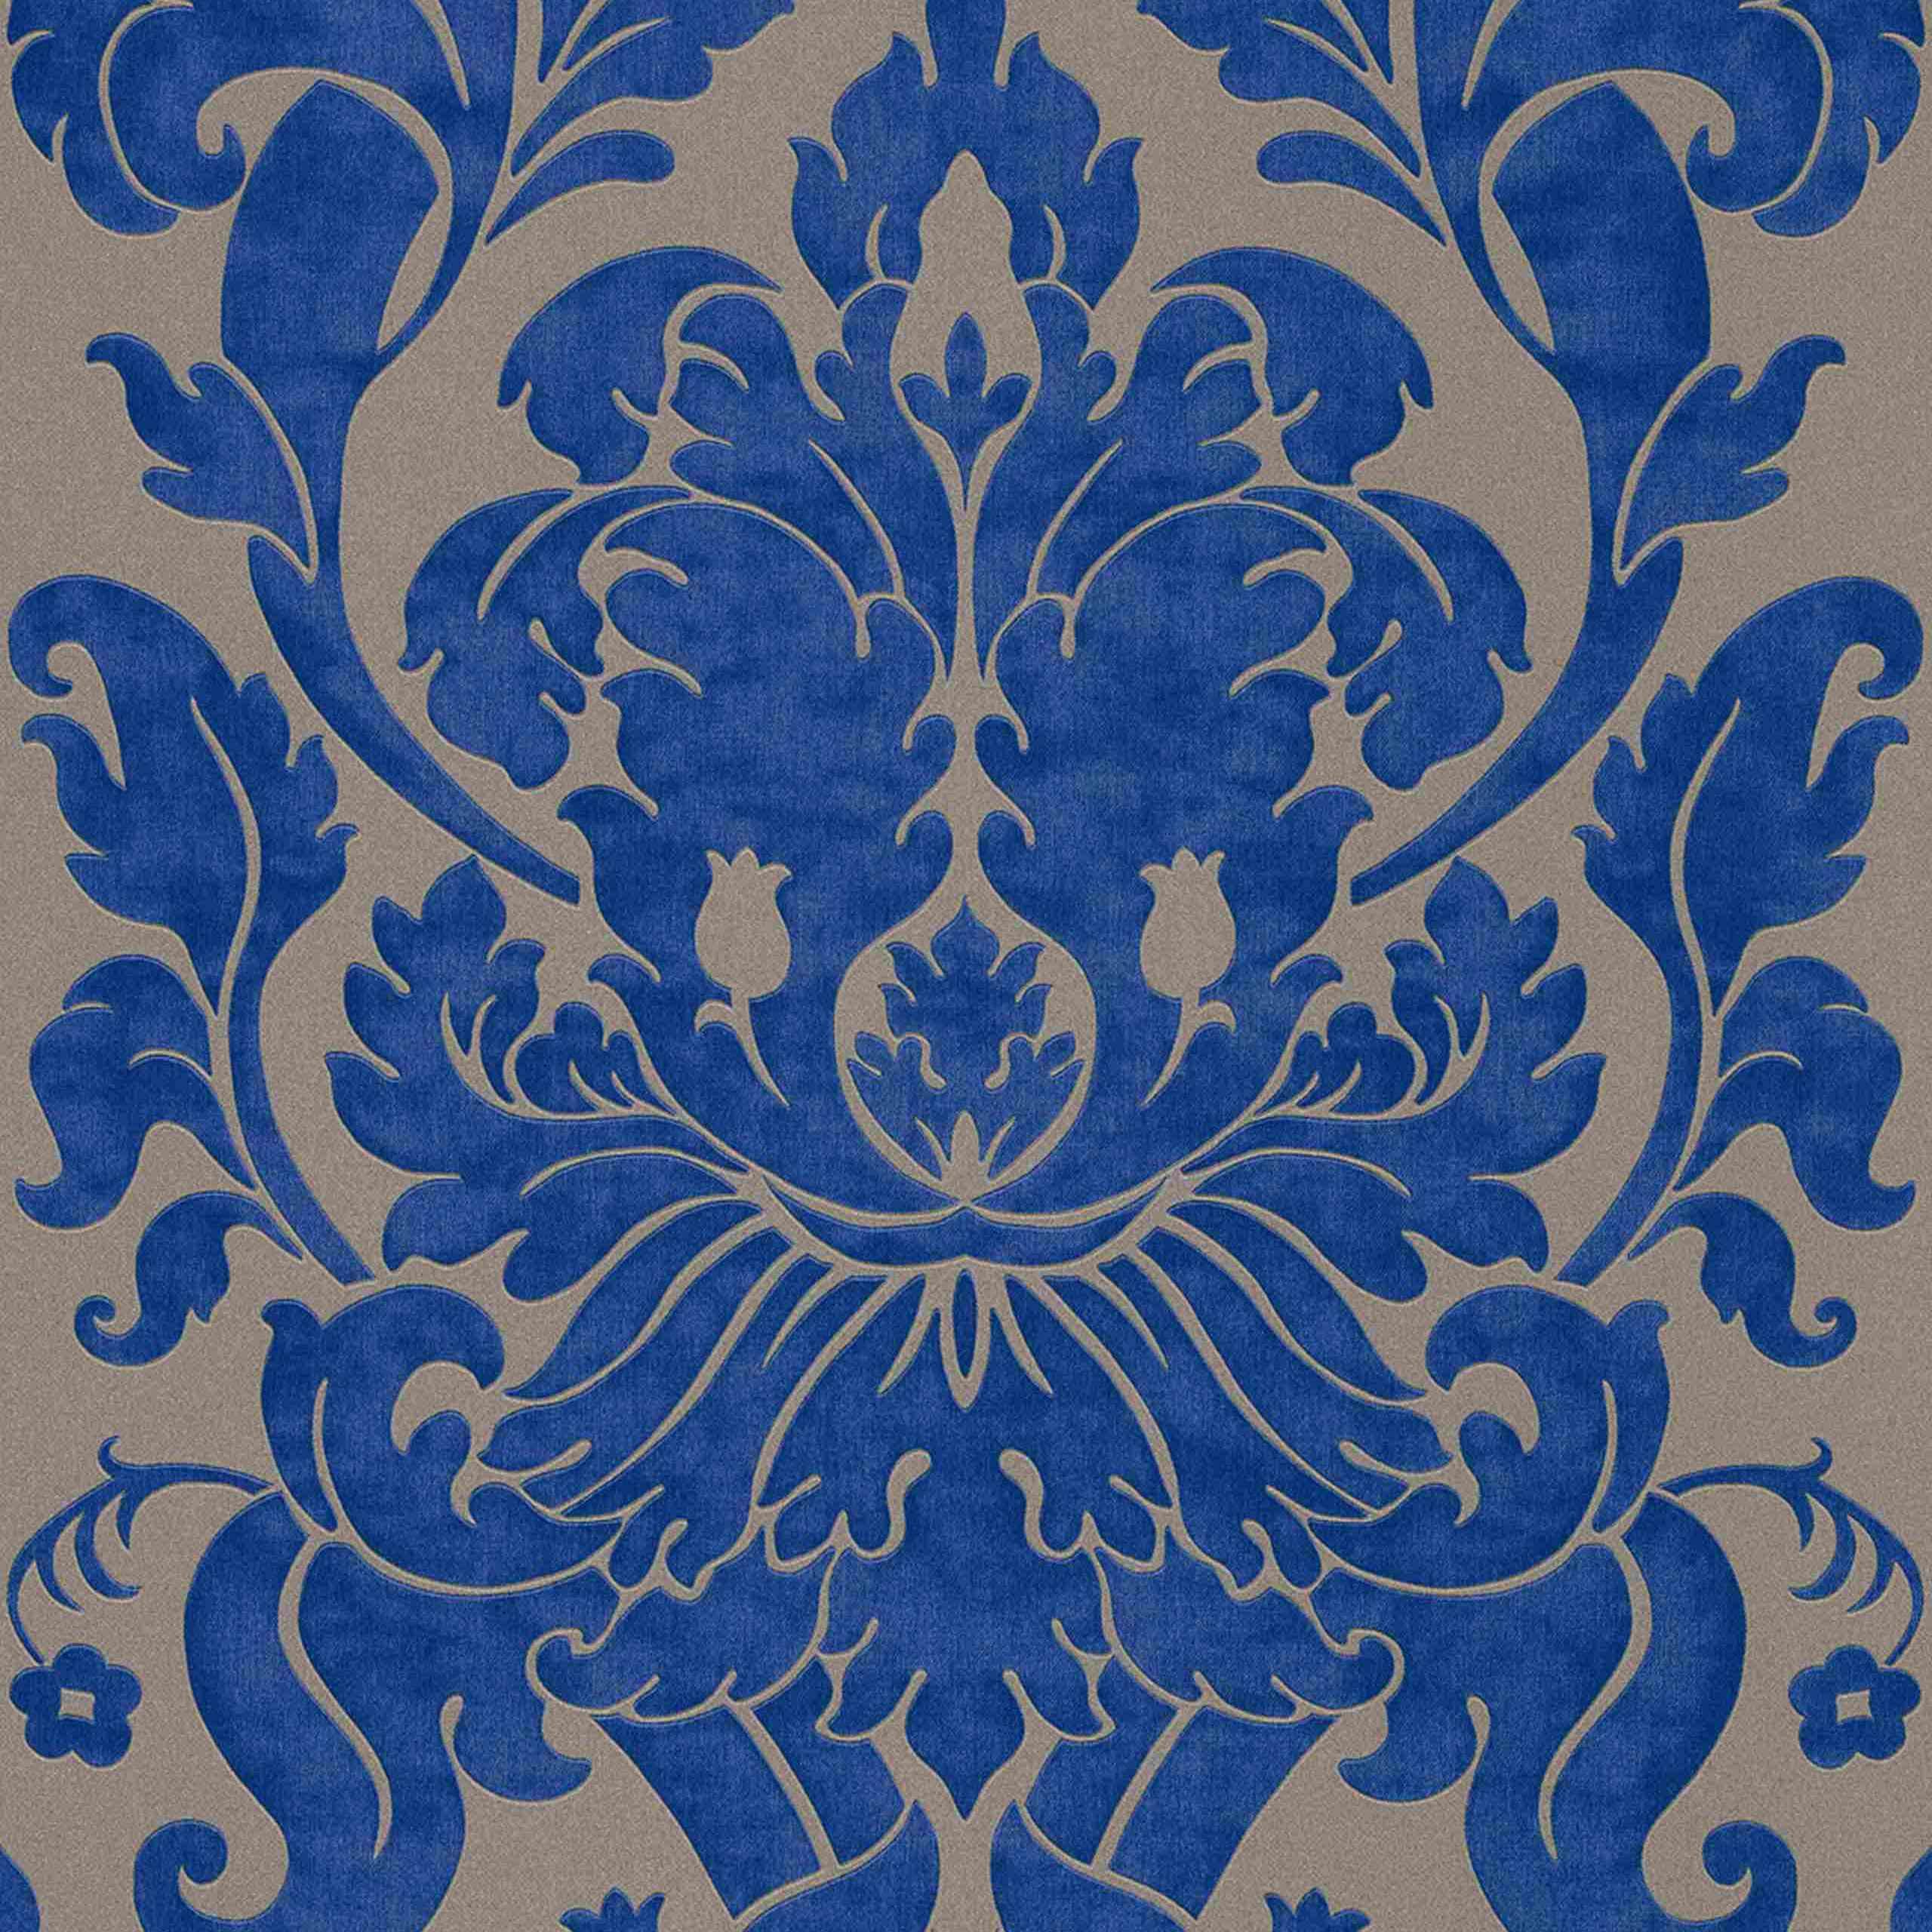 Rasch Vlies-Tapete Kollektion 'En Suite' 546415 Vintage, Barock-Dekor